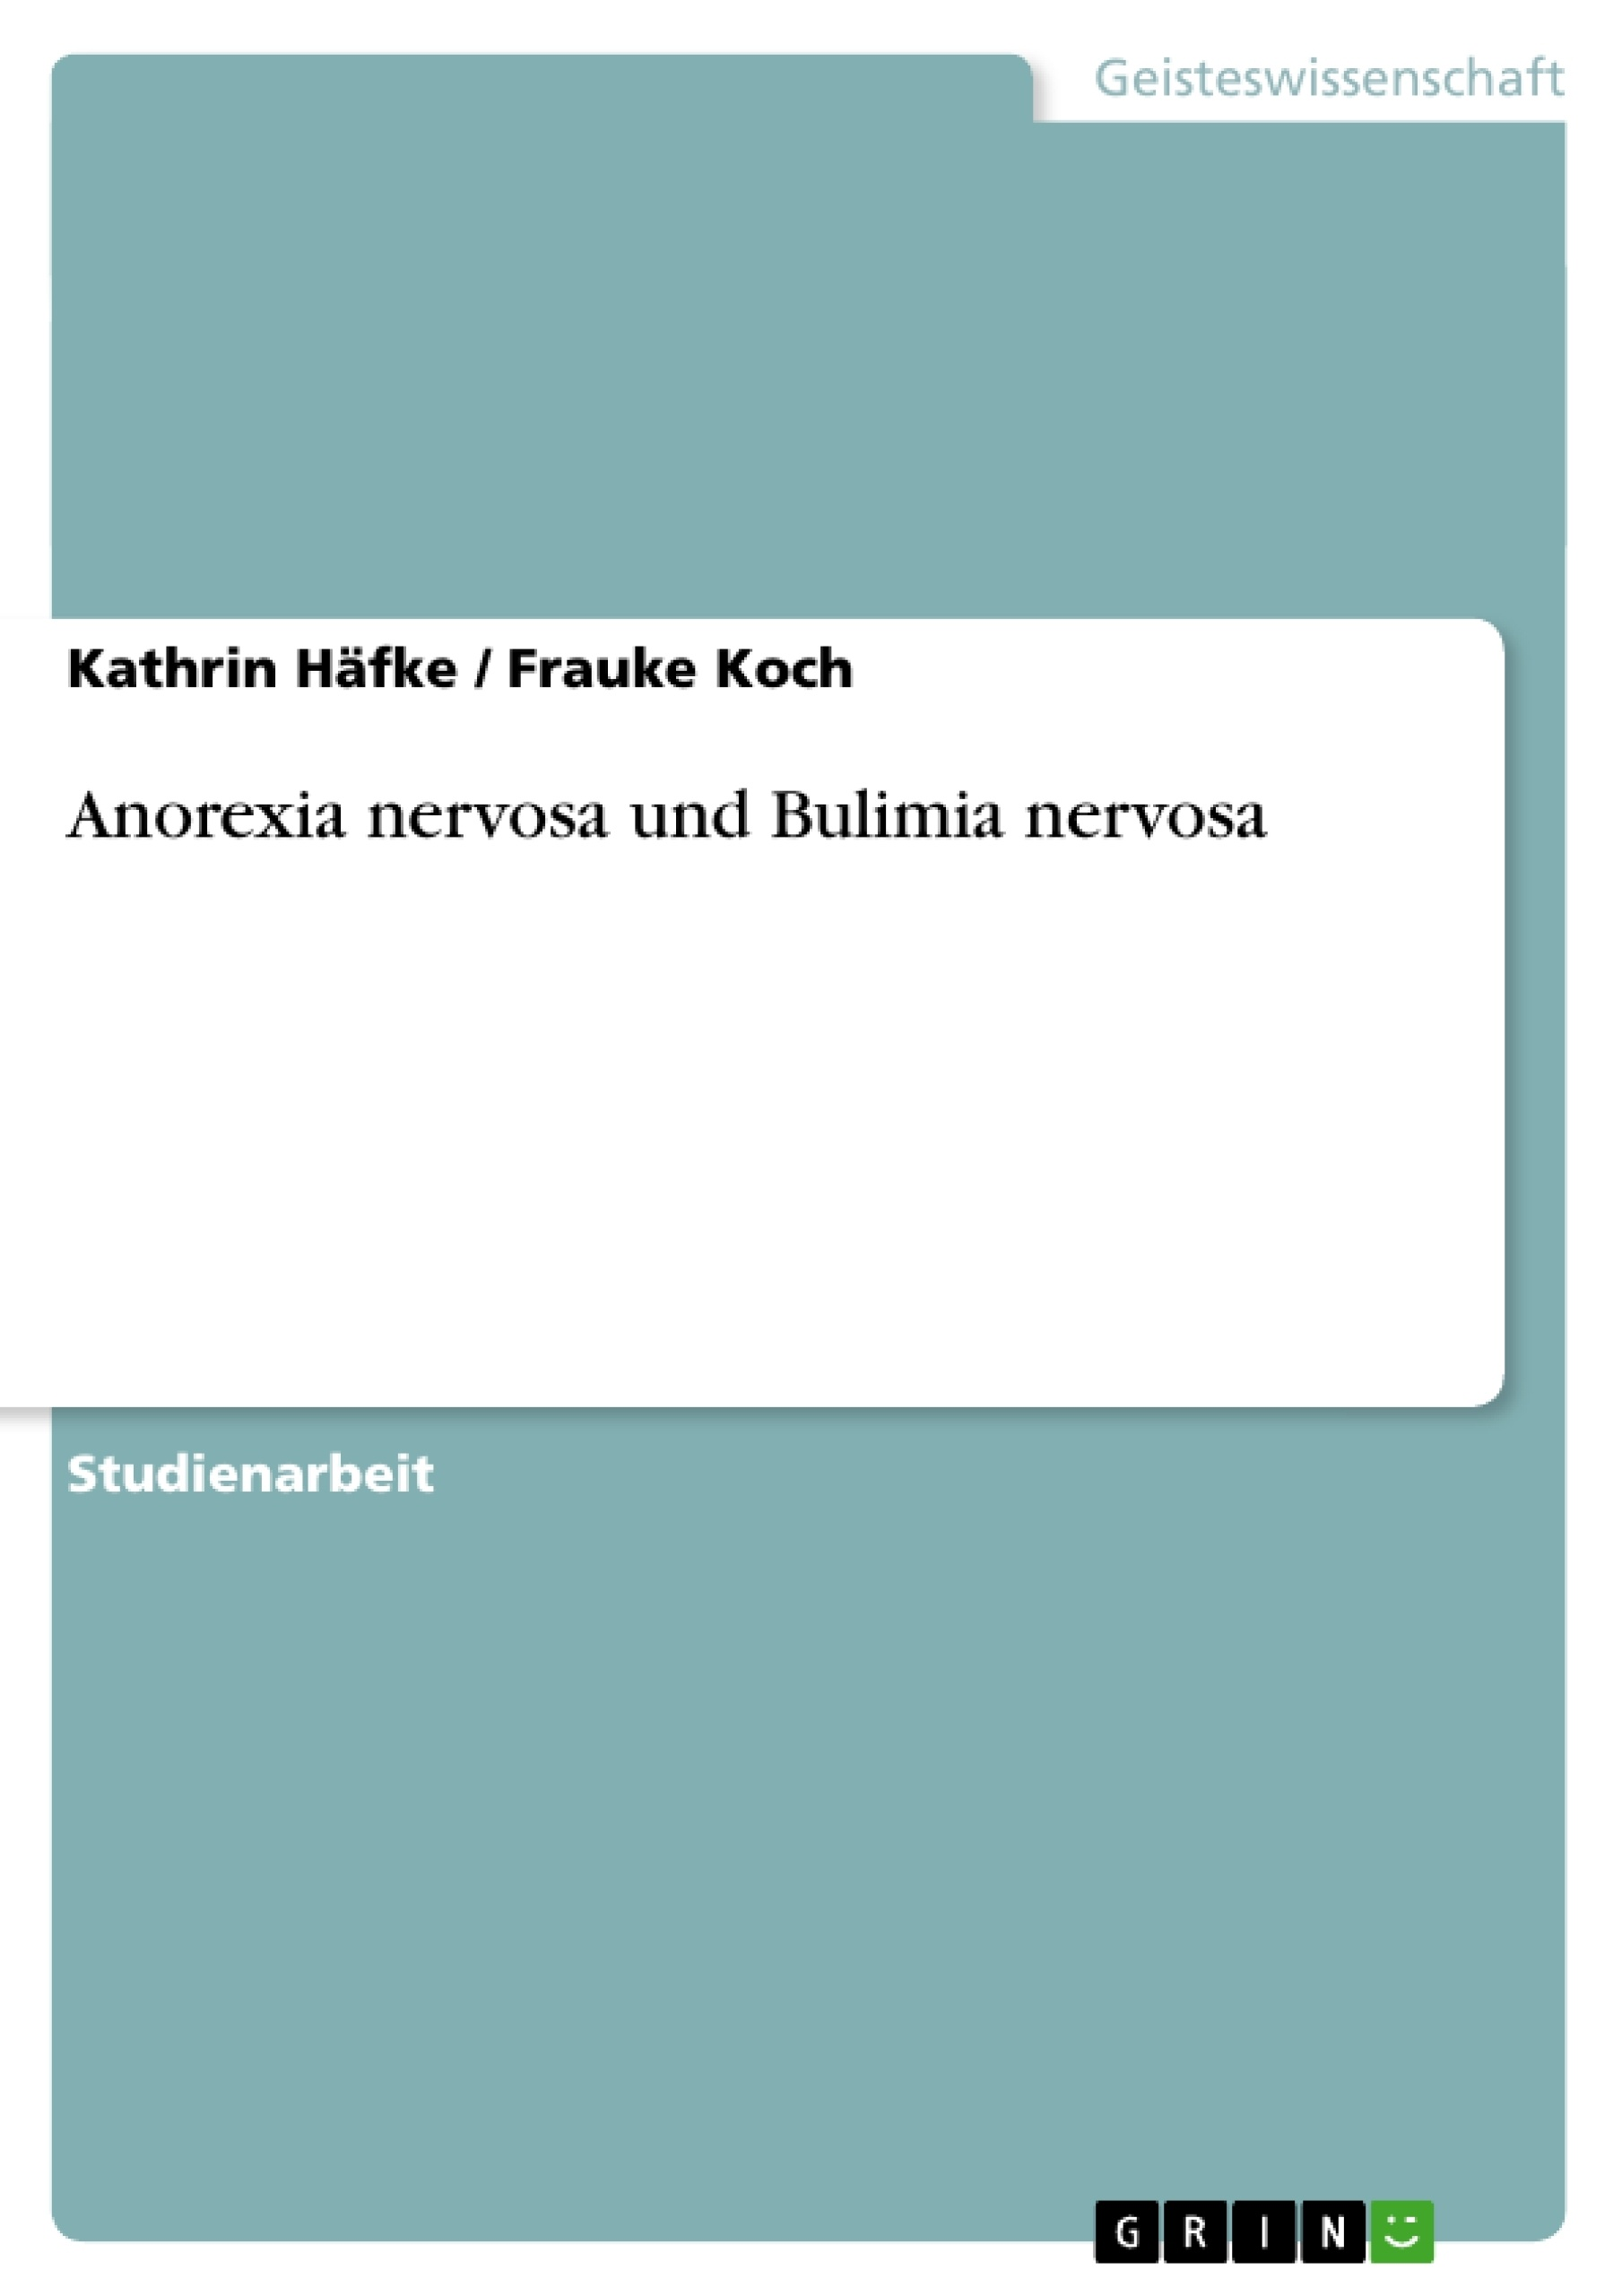 Titel: Anorexia nervosa und Bulimia nervosa